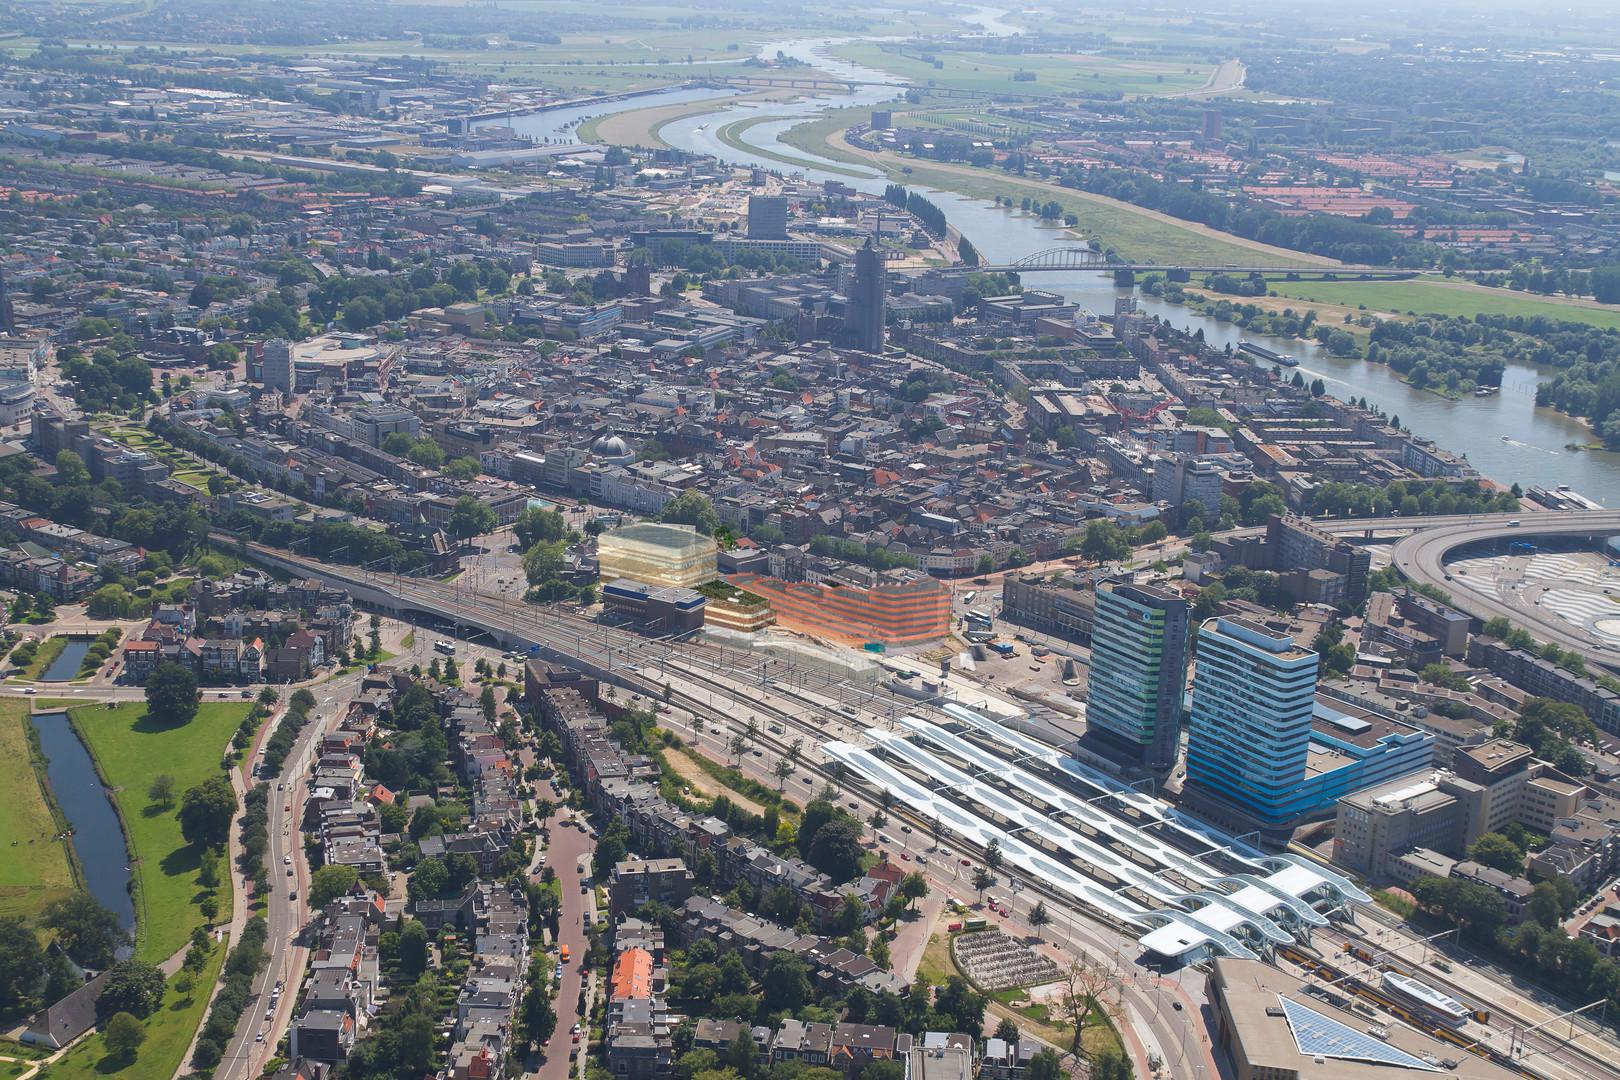 Arnhem central gardens